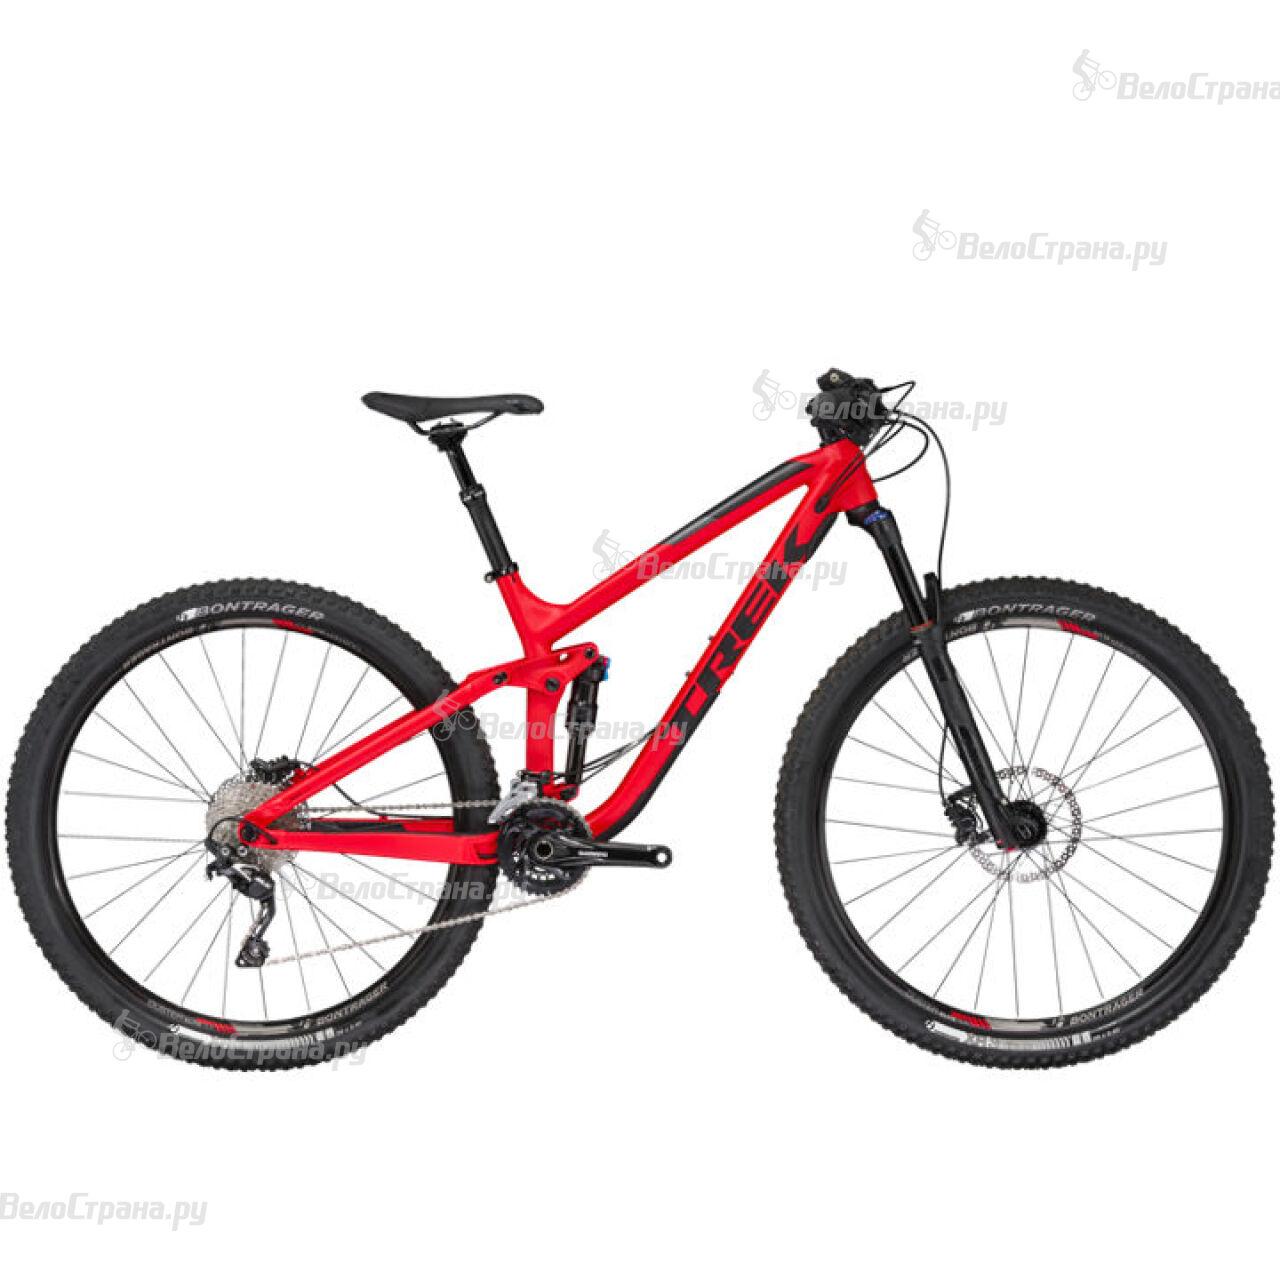 Велосипед Trek Fuel EX 7 29 (2017)